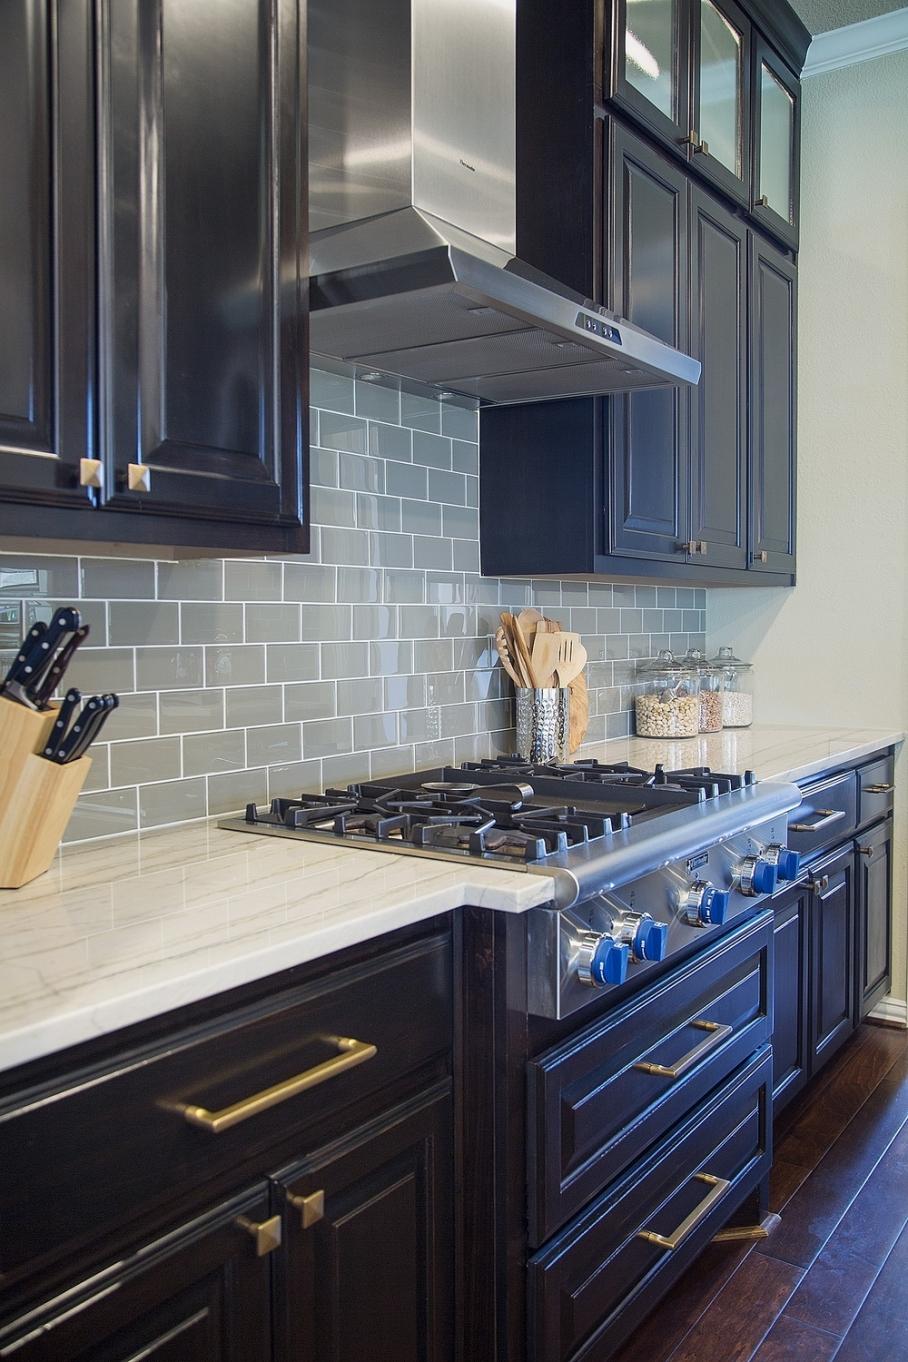 Kitchen remodel; stove; cabinetry; countertop | Interior Designer: Carla Aston / Photography by Tori Aston